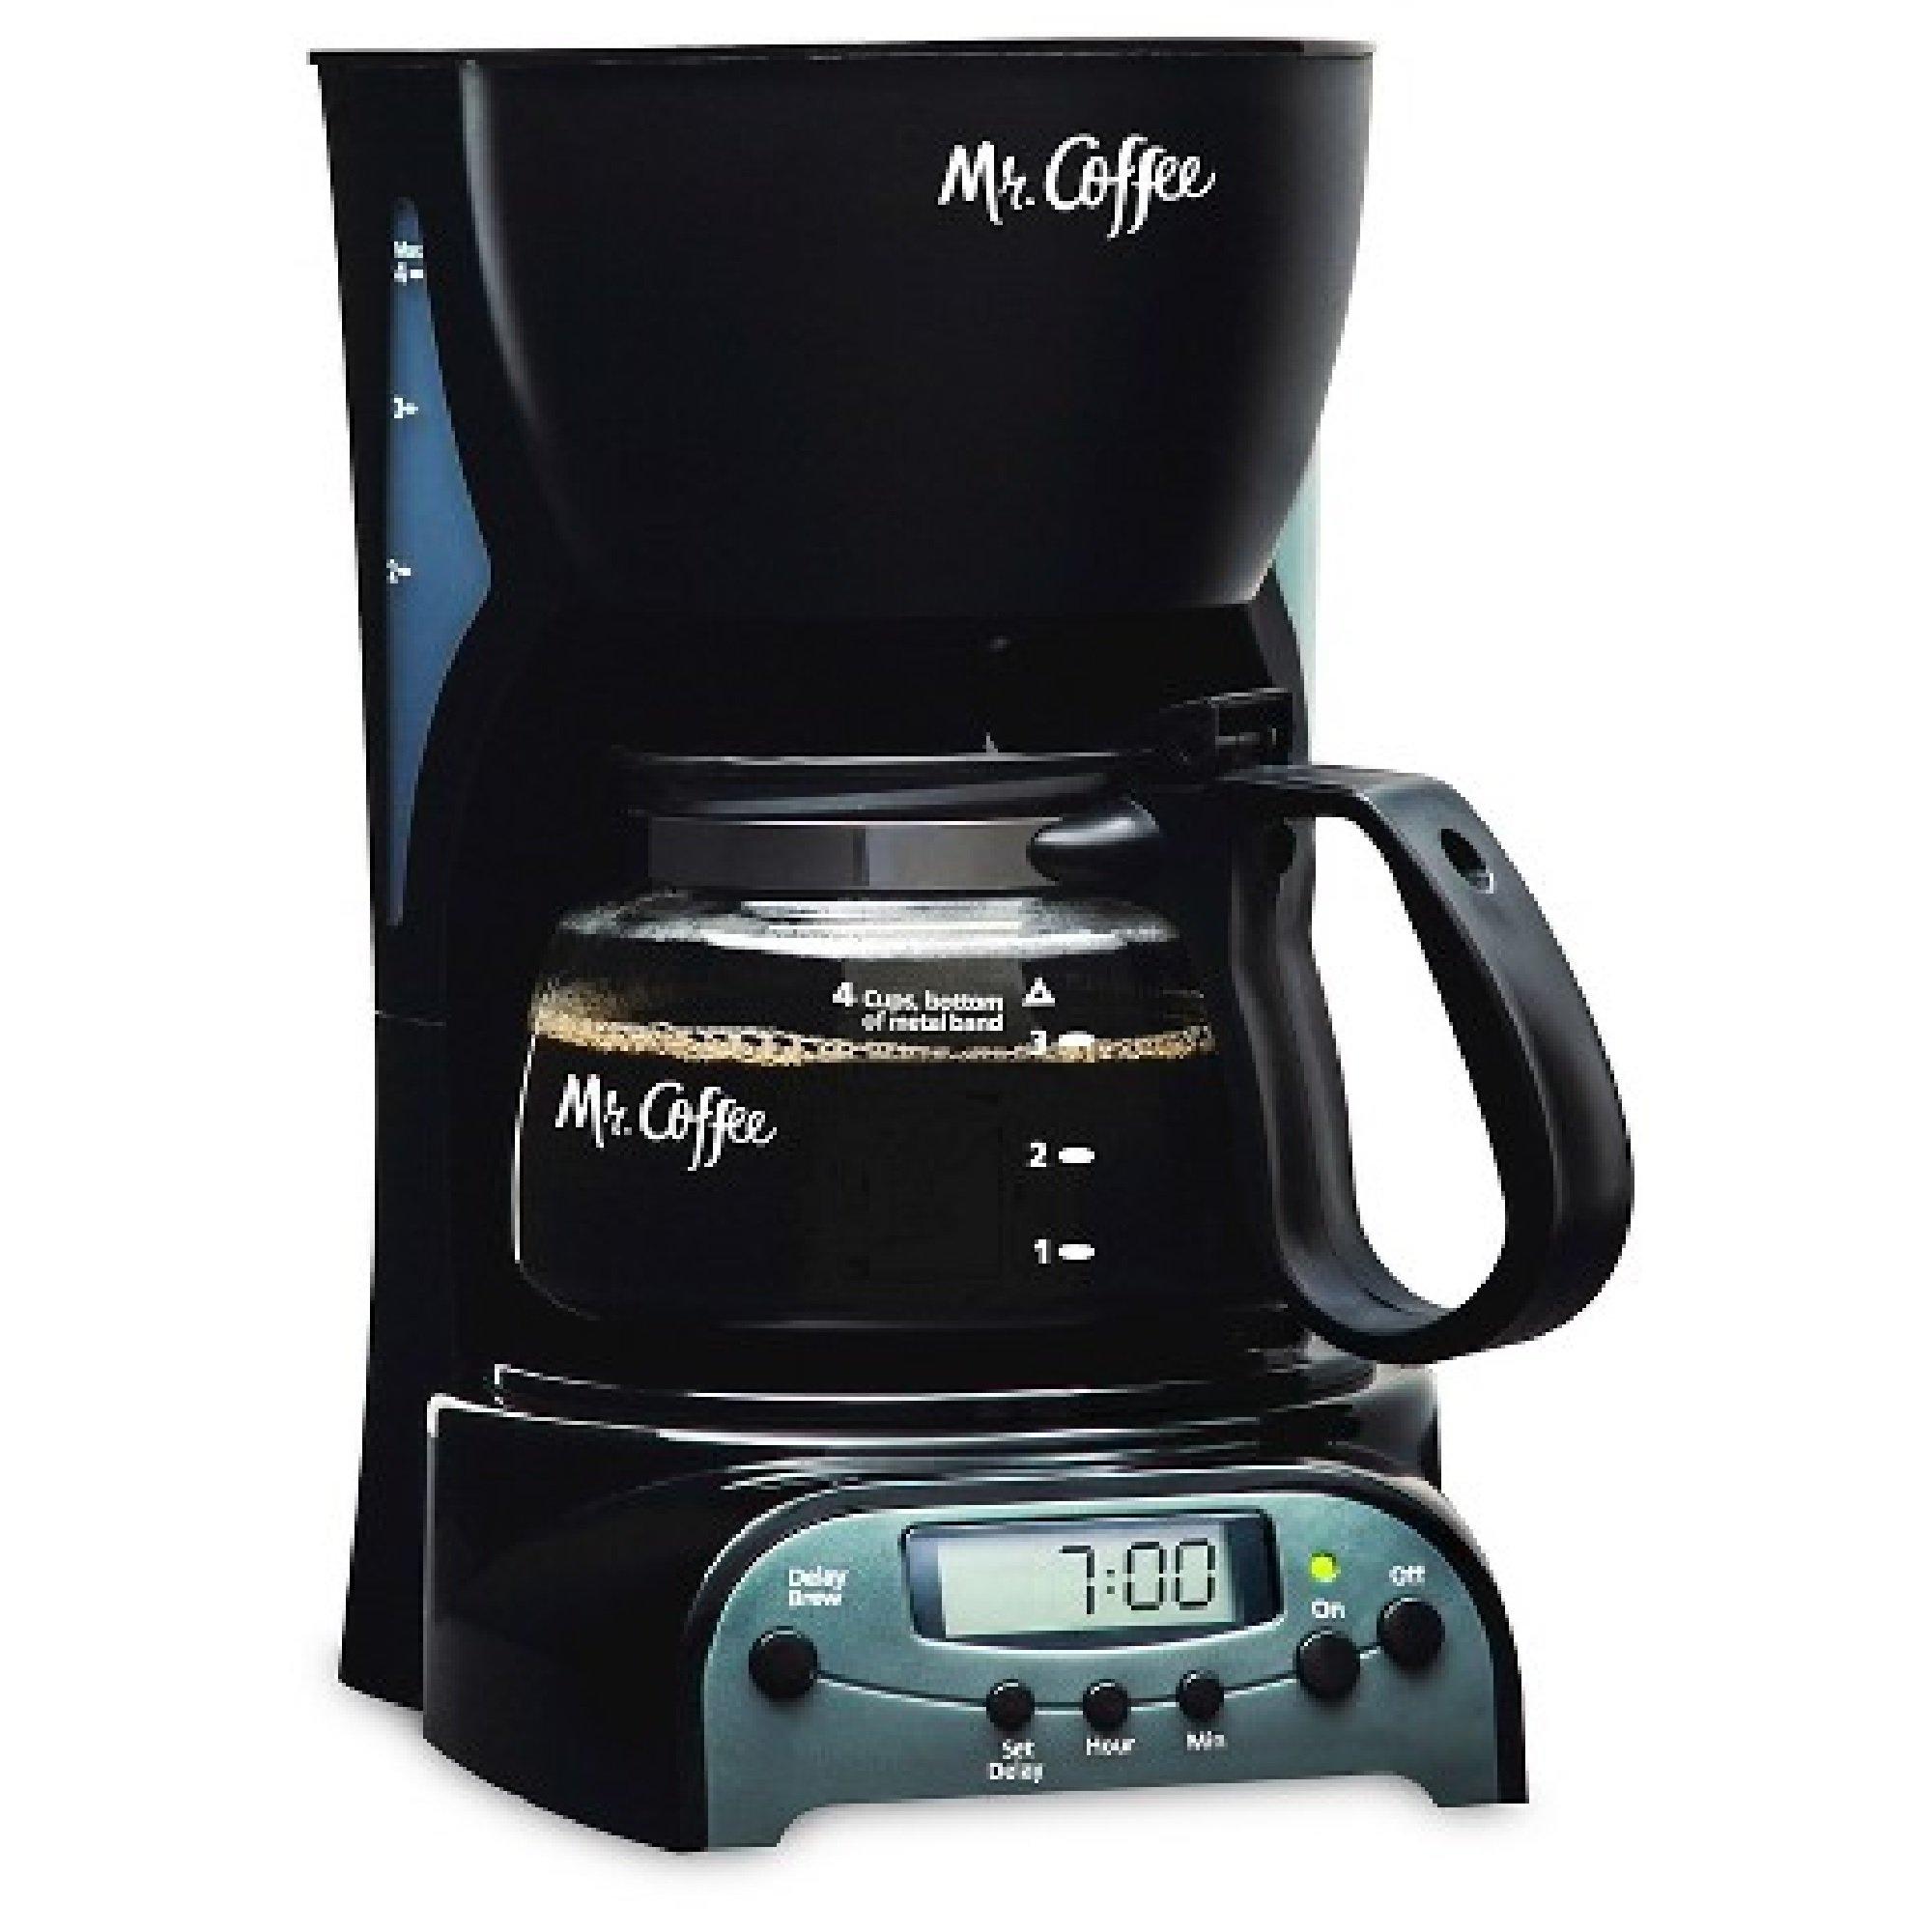 Mr.Coffee 4-Cup Programmable Coffeemaker